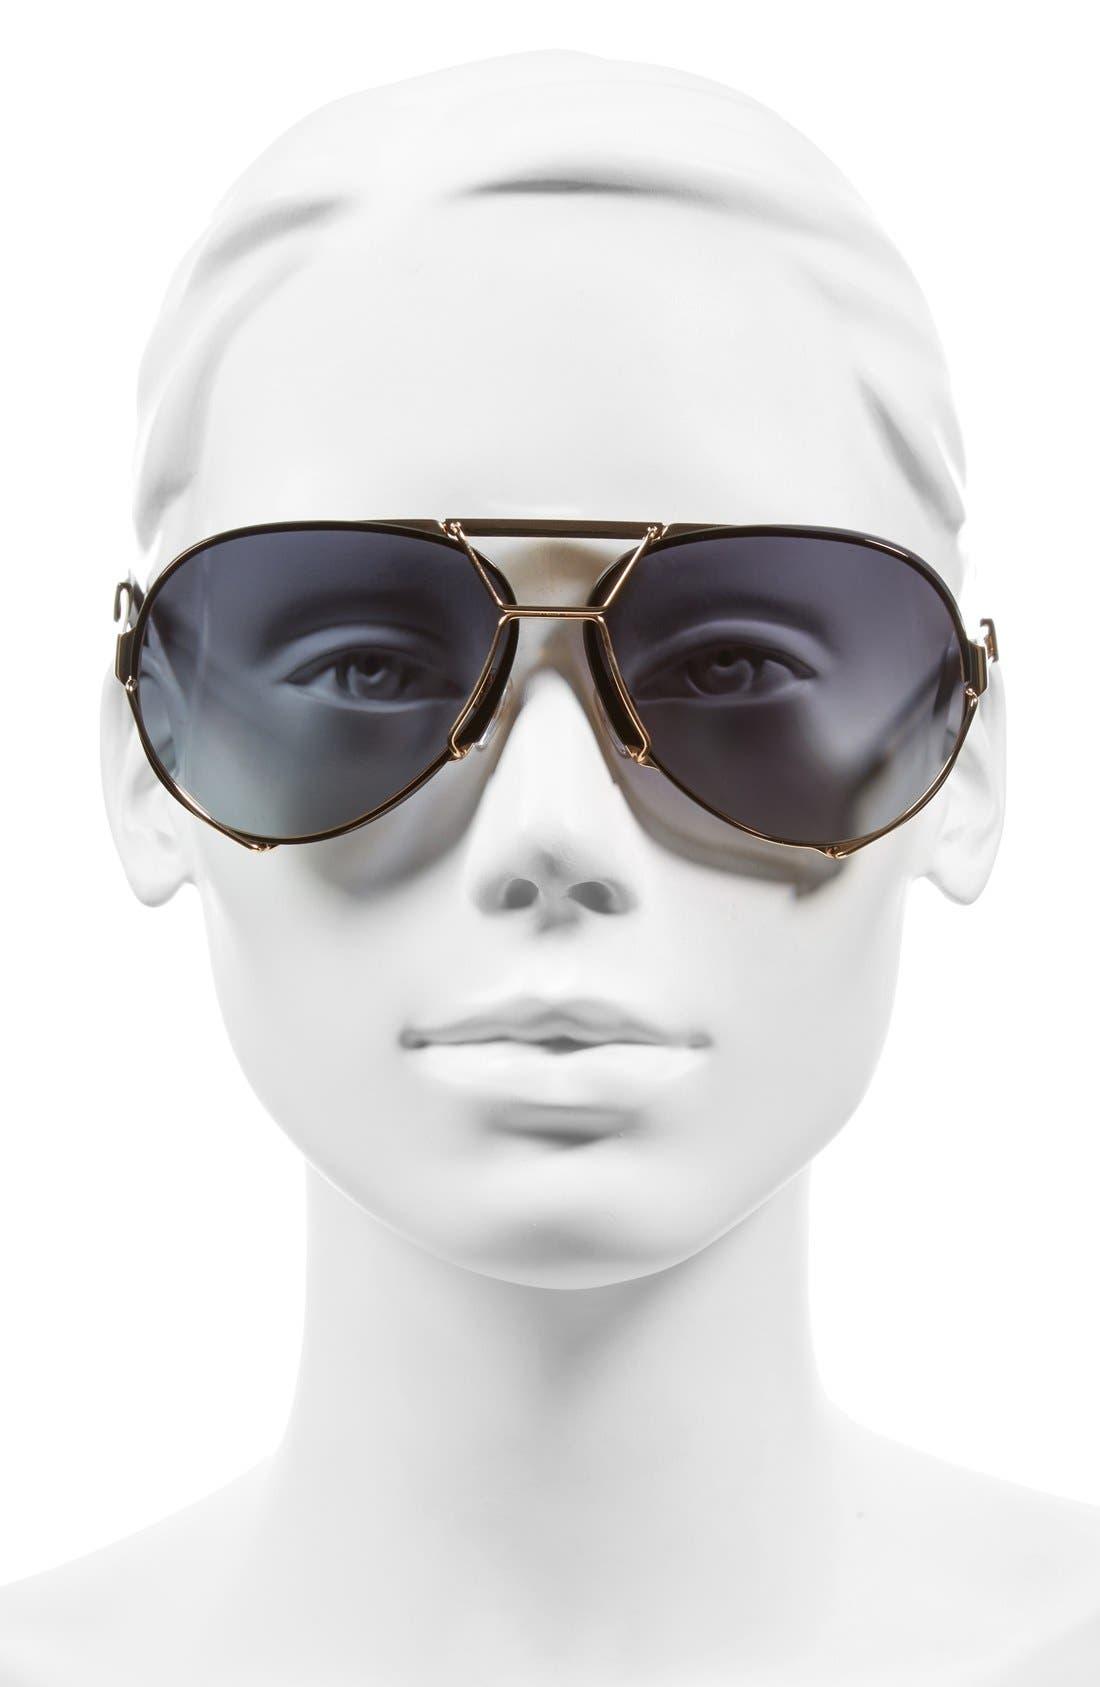 65mm Aviator Sunglasses,                             Alternate thumbnail 2, color,                             GOLD/ GREY